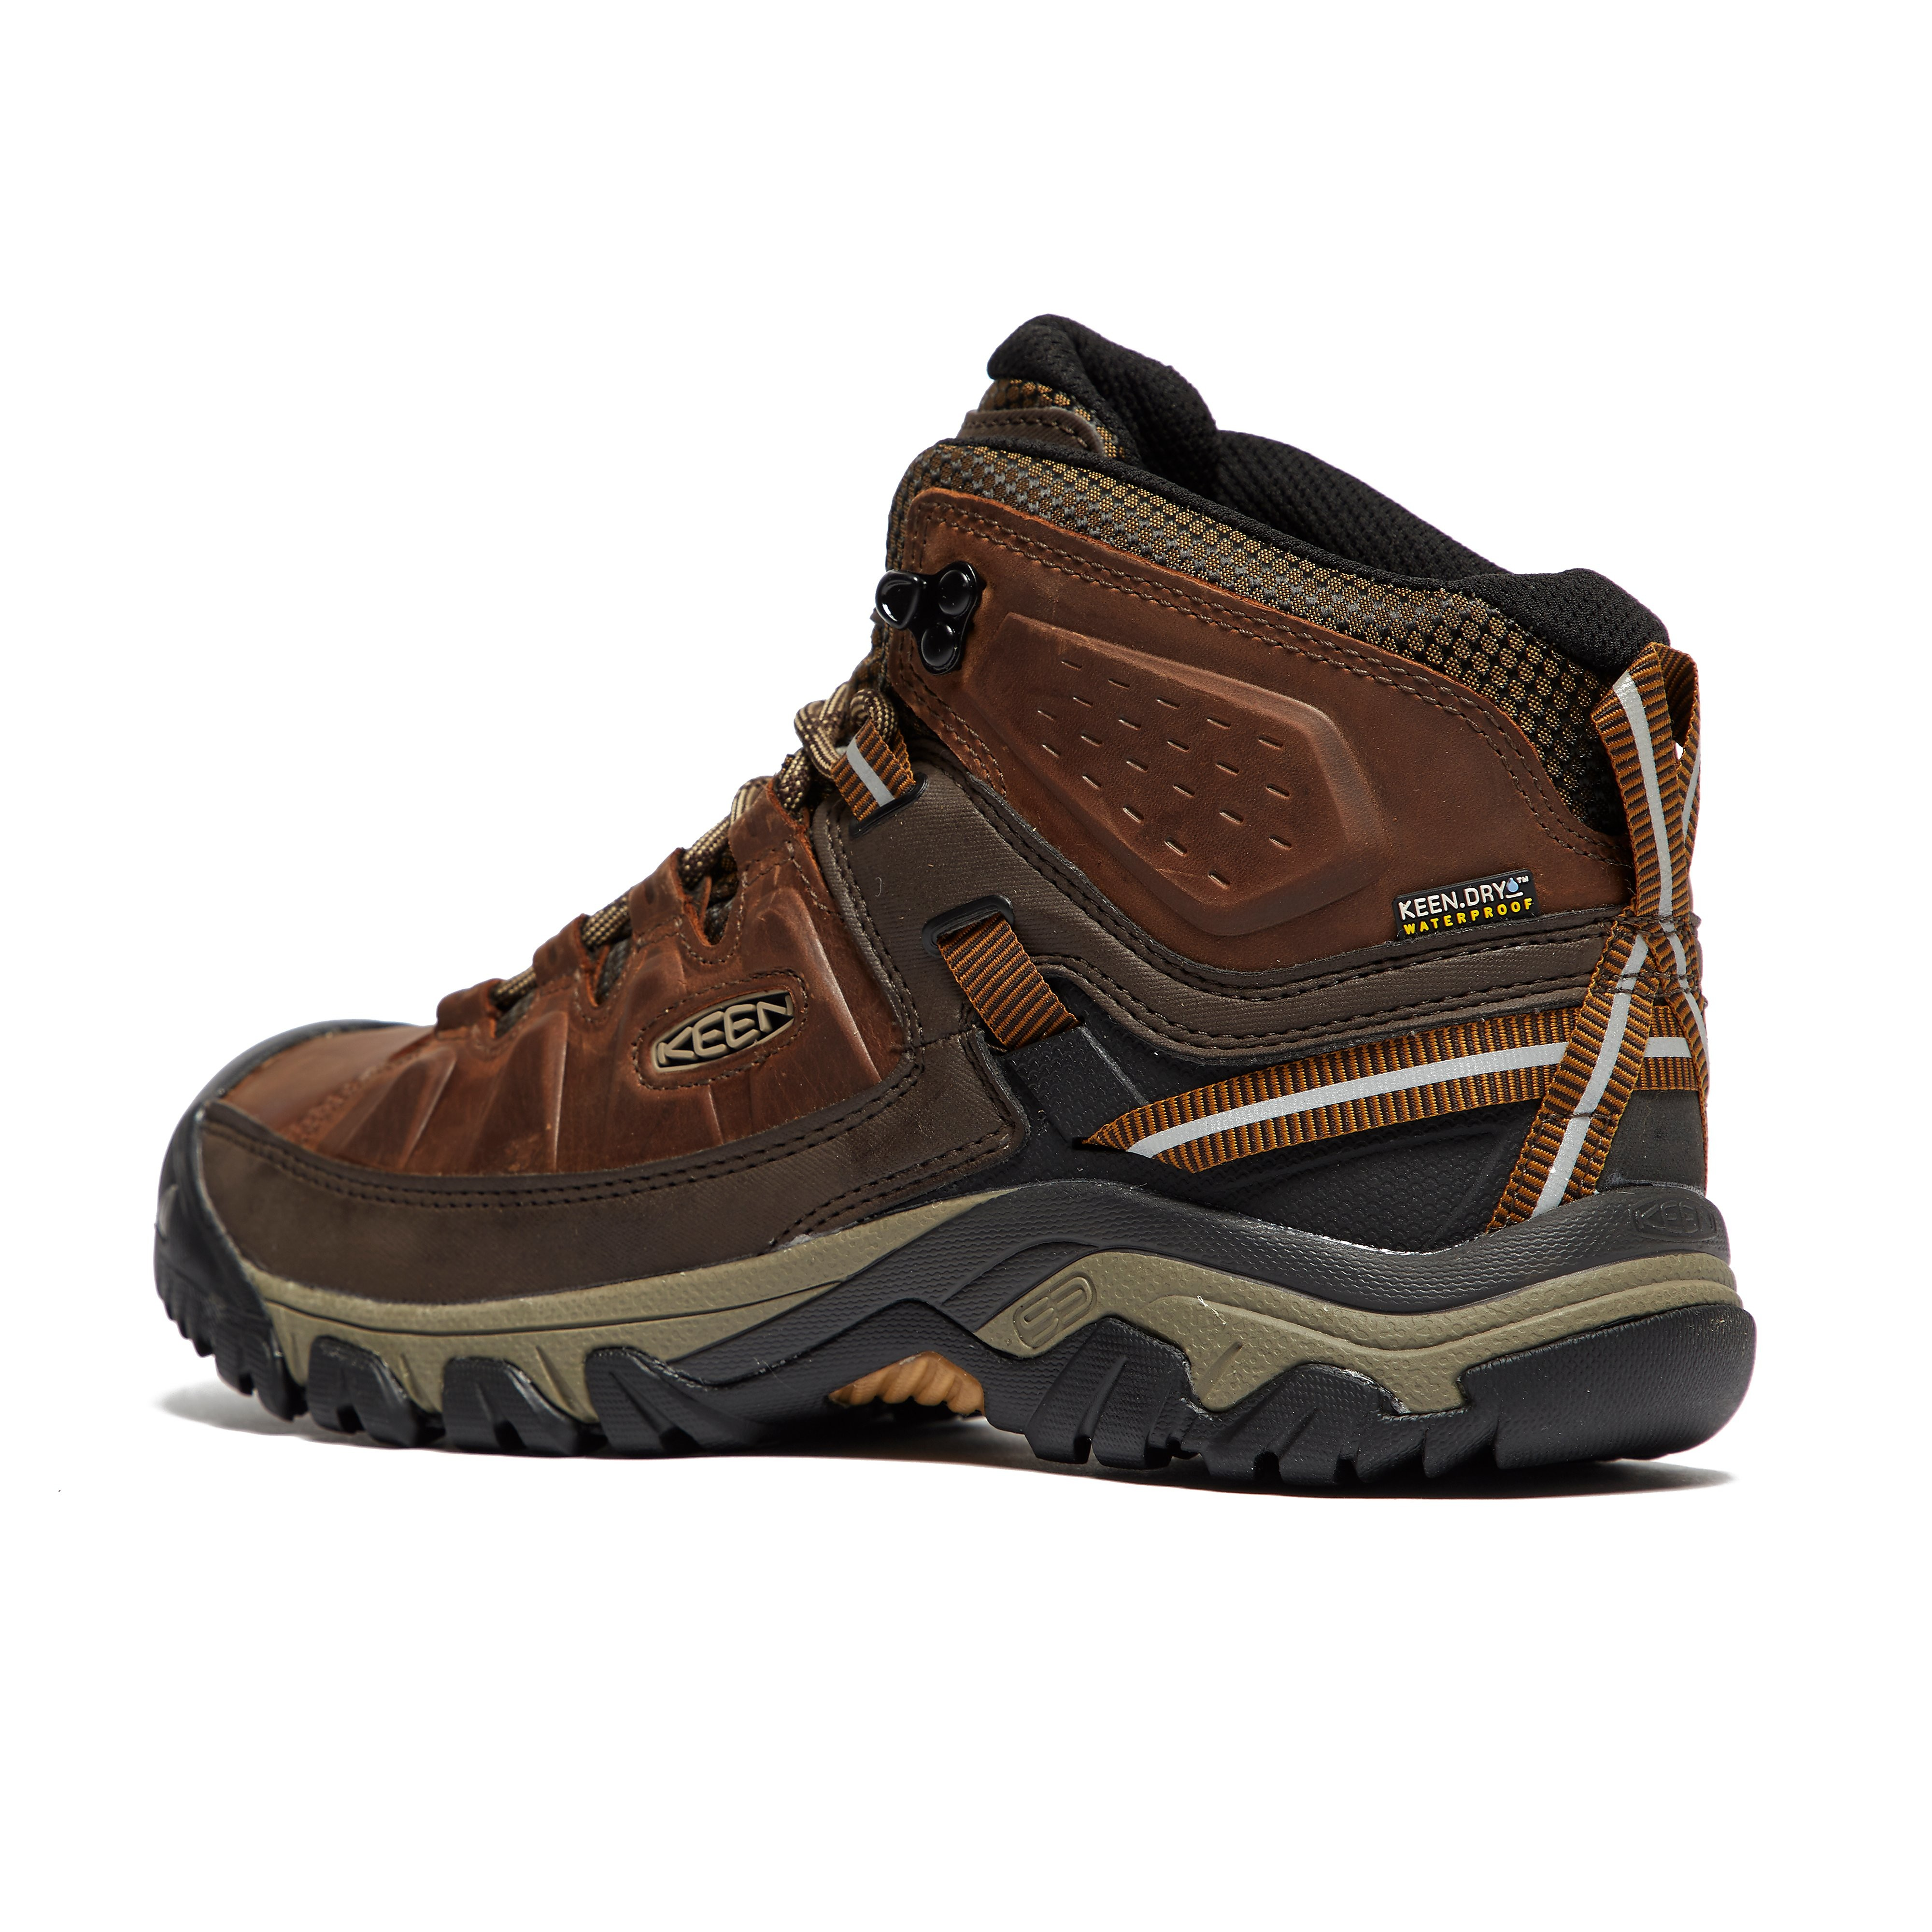 Keen Targhee III Mid Waterproof Men's Walking Boots